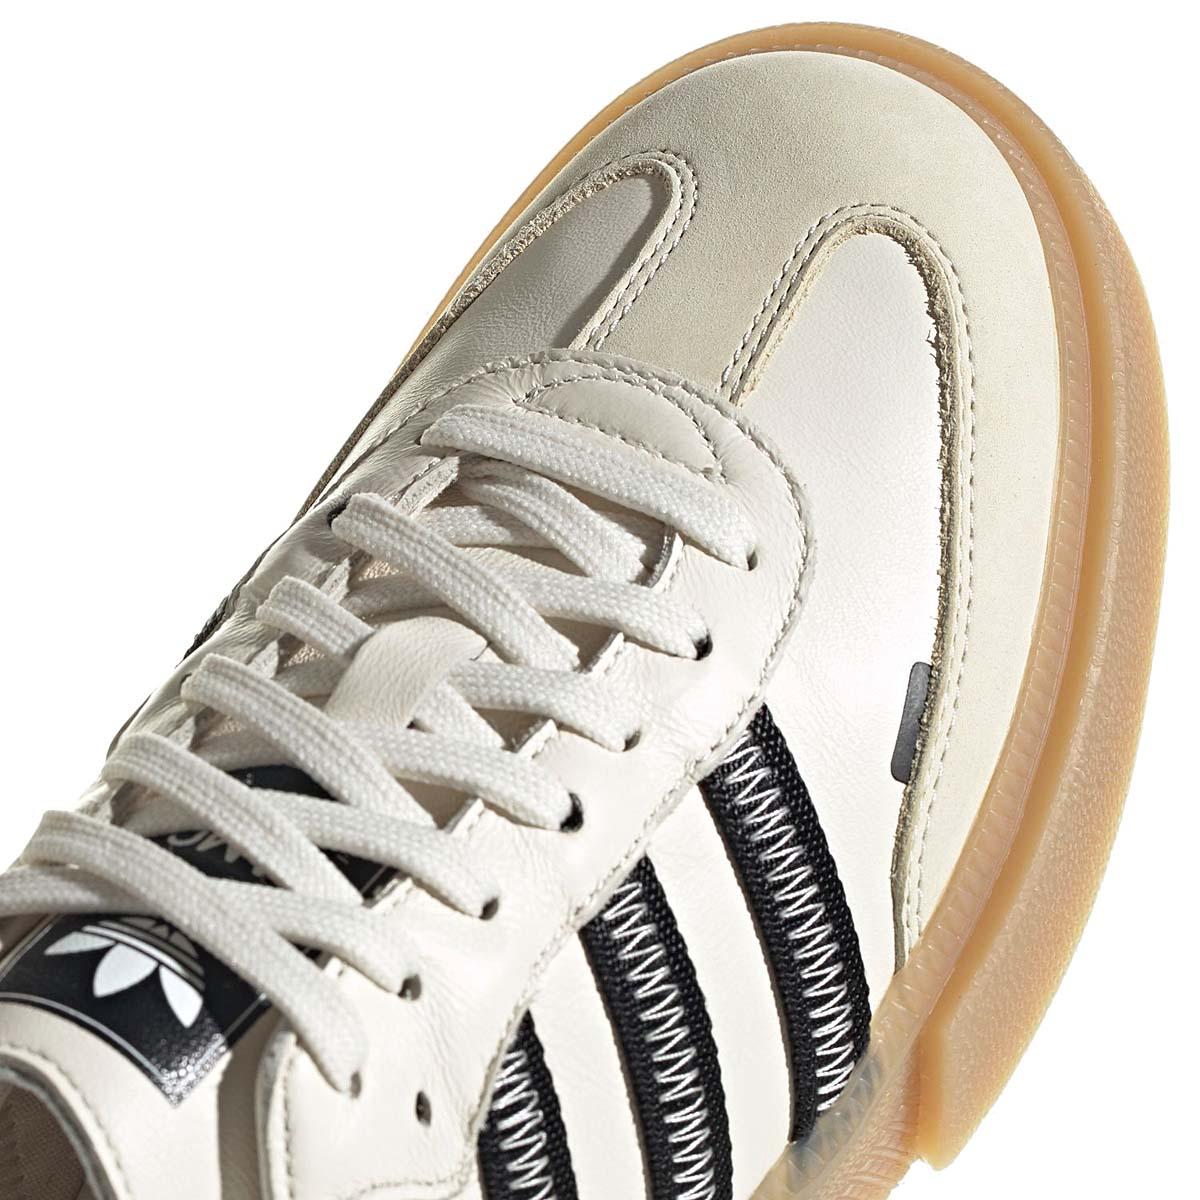 adidas Originals x OAMC TYPE O-8 CLOUD WHITE / CLOUD WHITE / CLOUD WHITE FY6958 アディダス オリジナルス × OAMC TYPE O-8 ホワイト